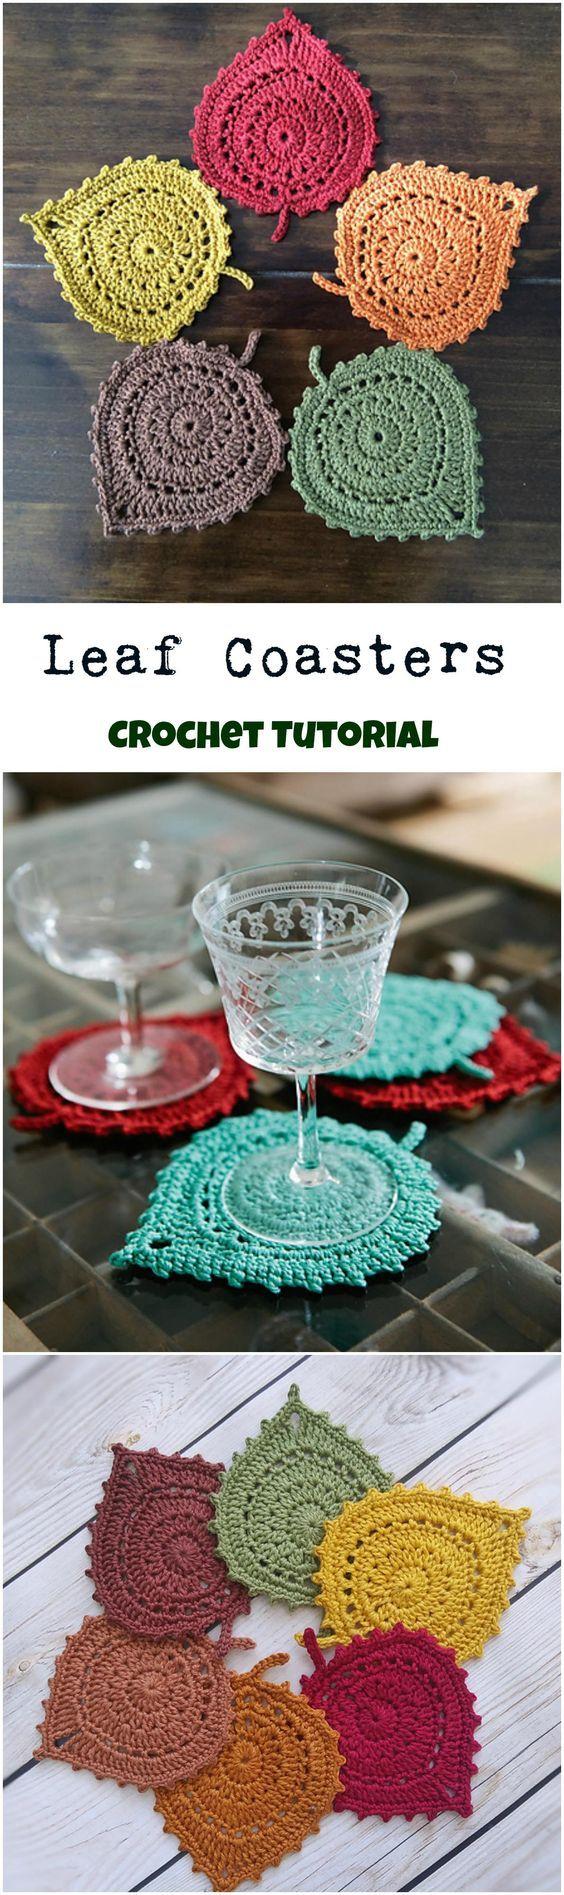 crochet leaf coasters | Crocheting Projects | Pinterest | Símbolos ...